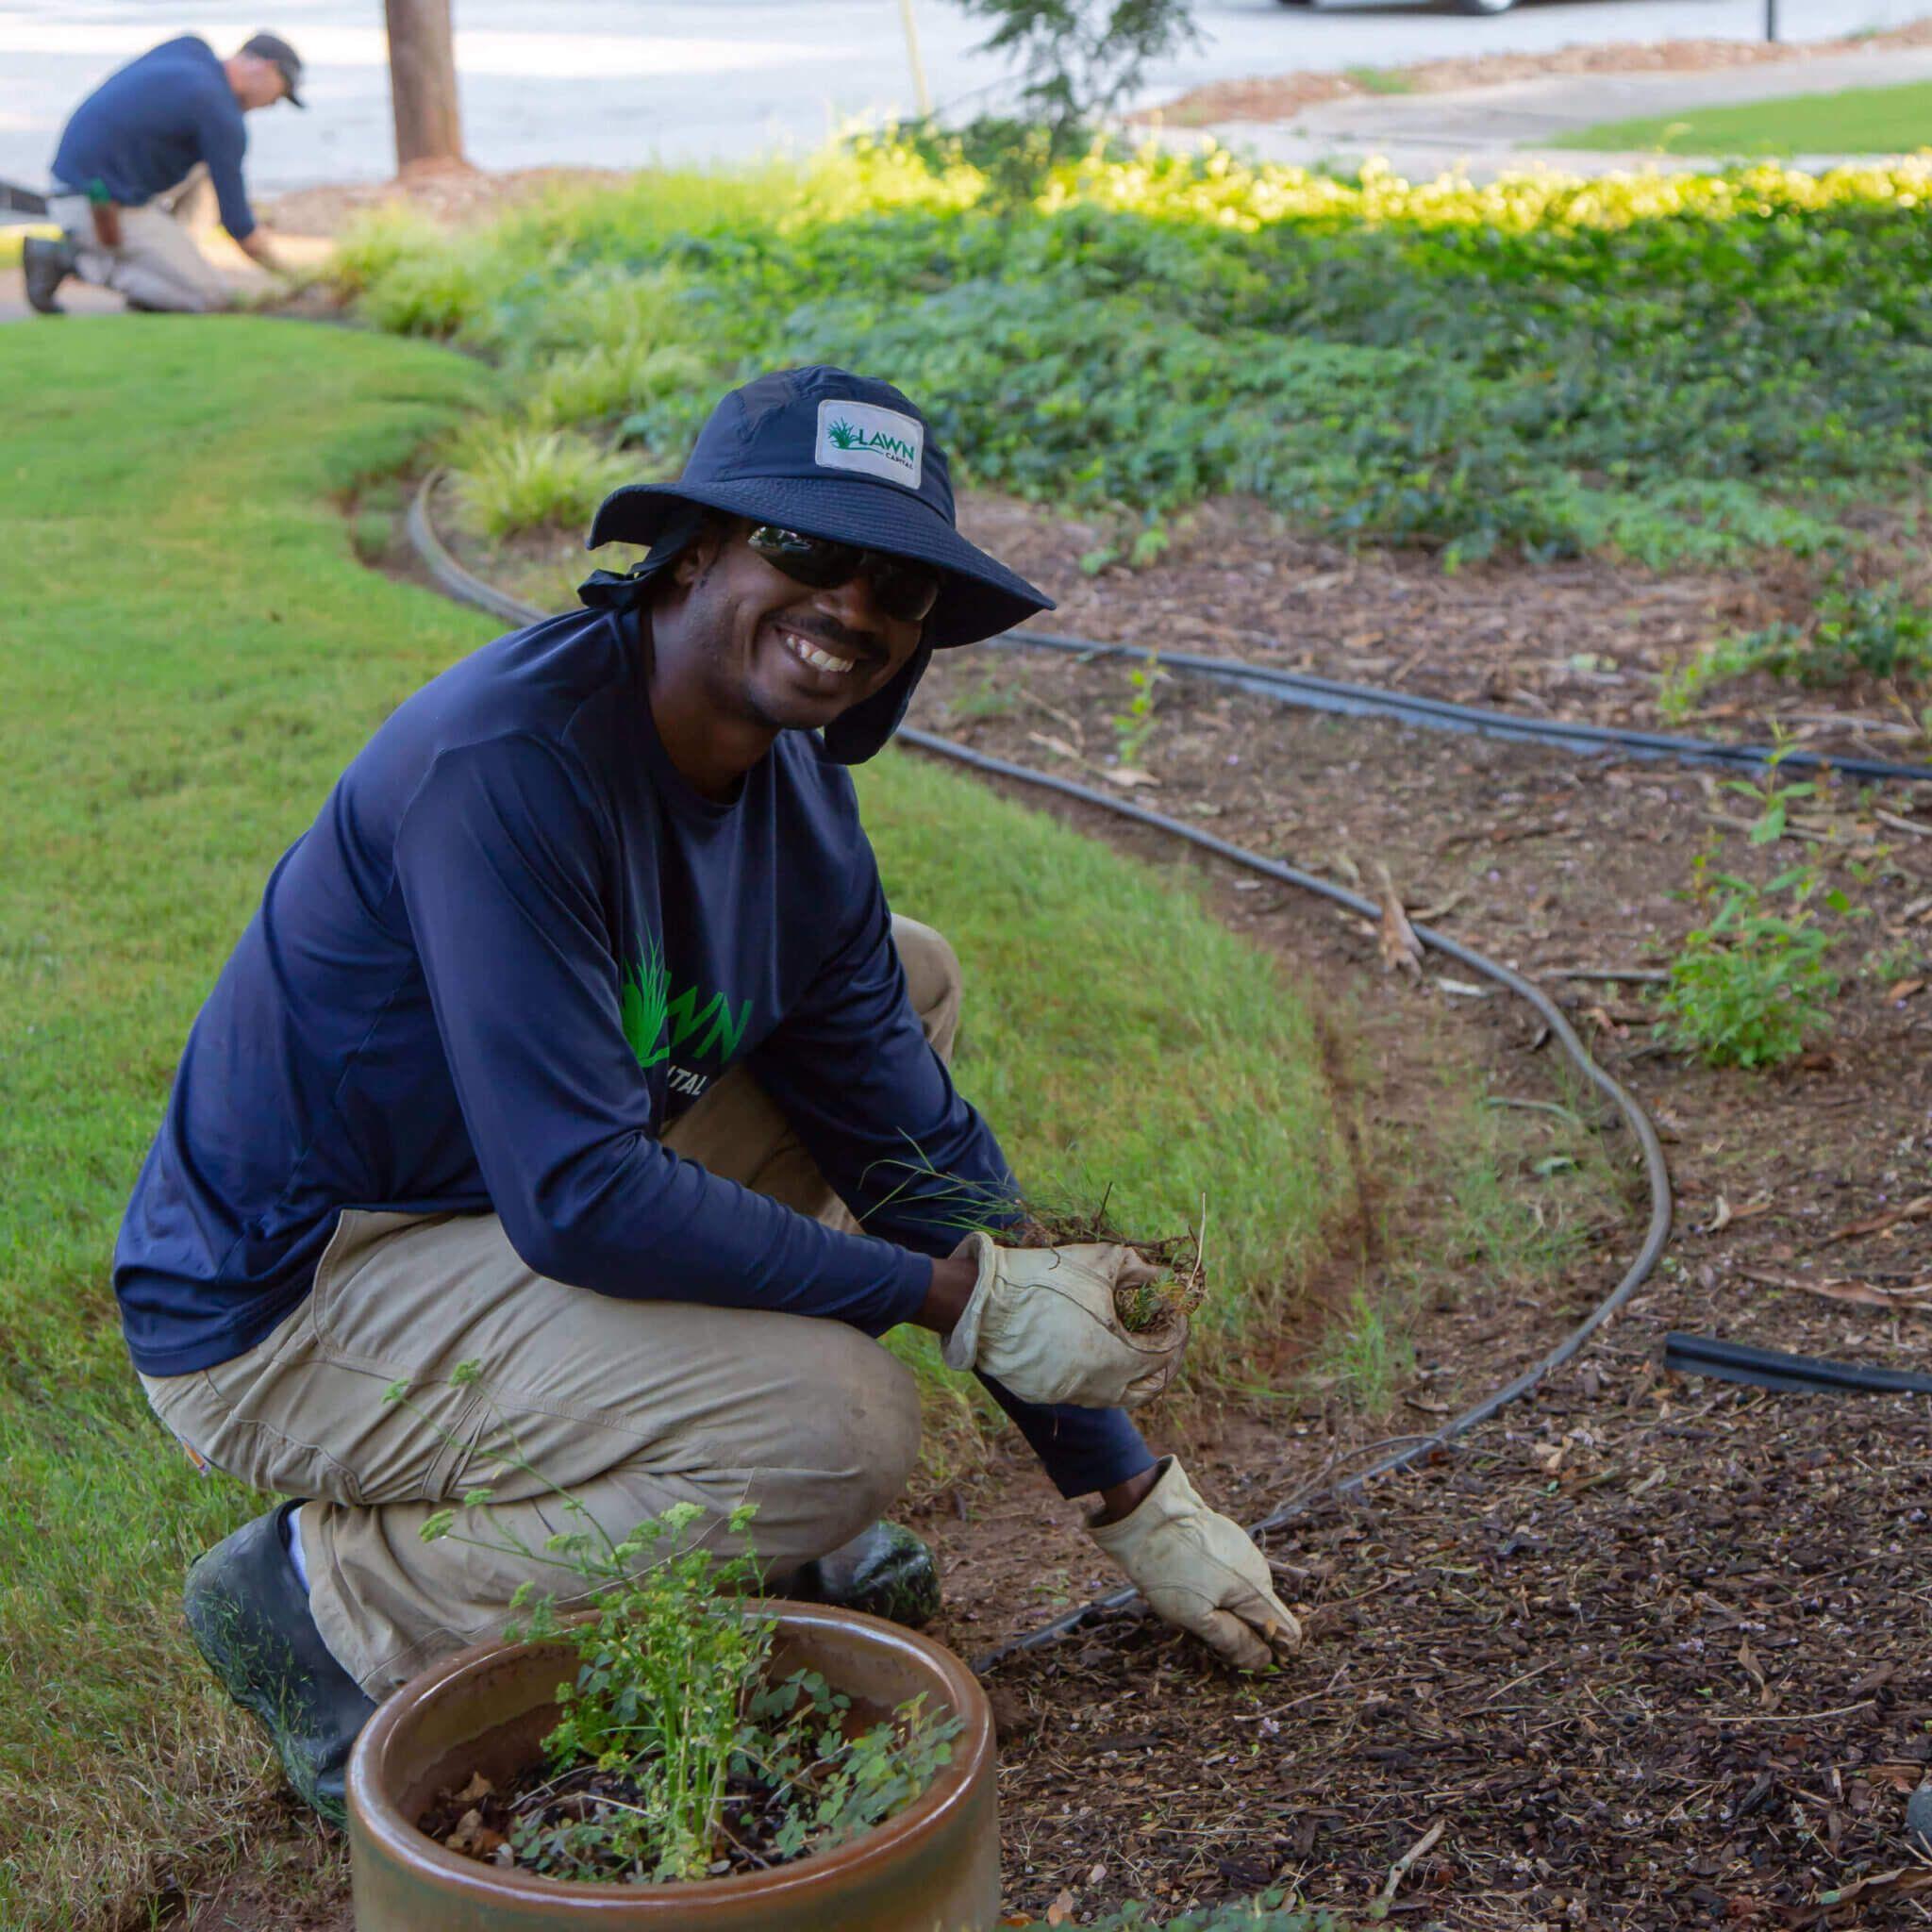 Landscaping Company Decatur Ga Landscaping Company Lawn Service Landscape Maintenance